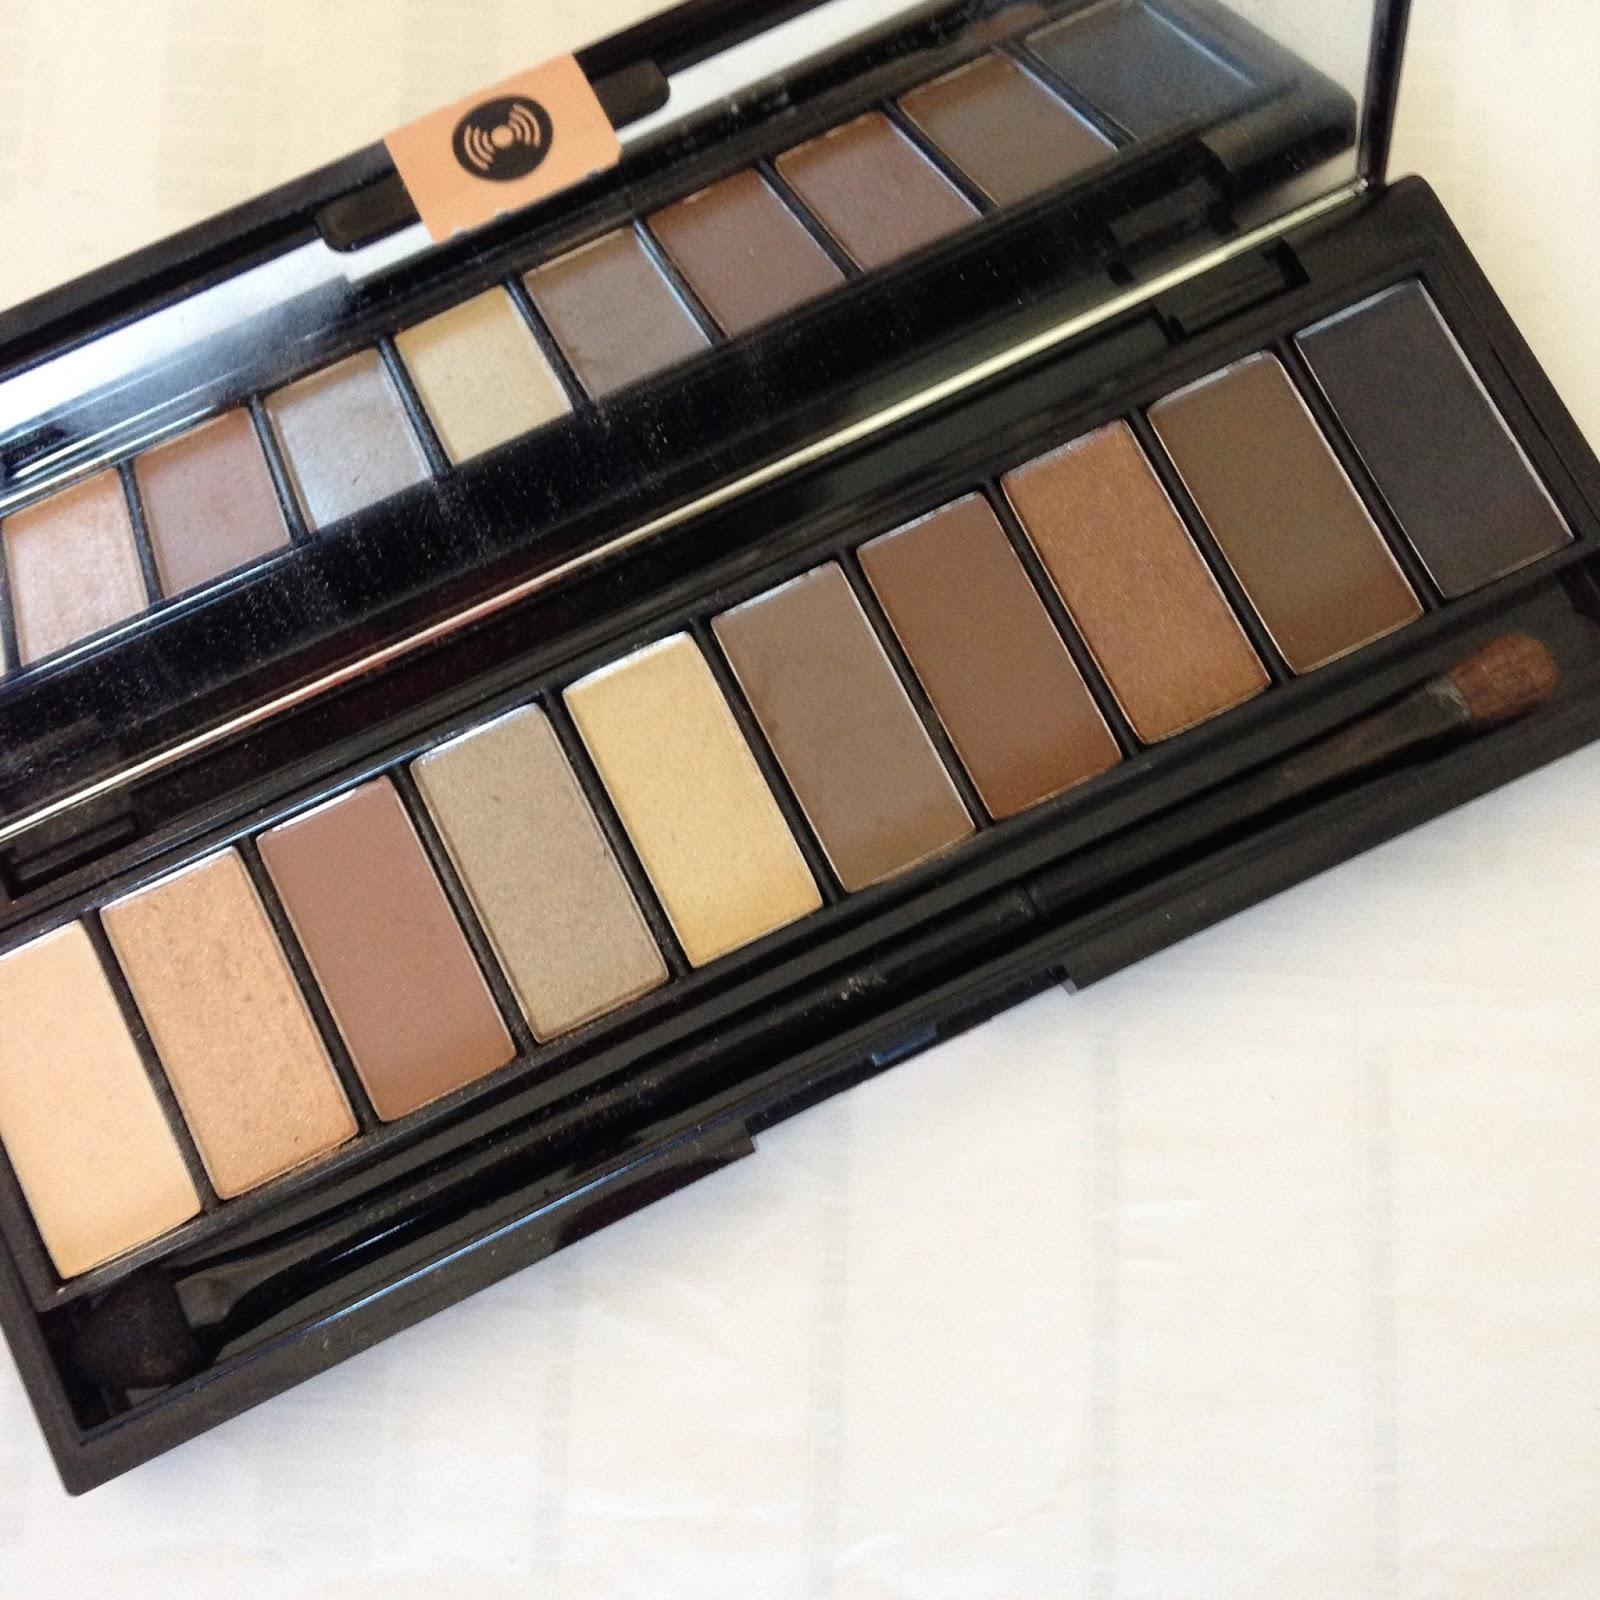 Review - L'Oreal La Palette Nude Beige Eyeshadow Palette